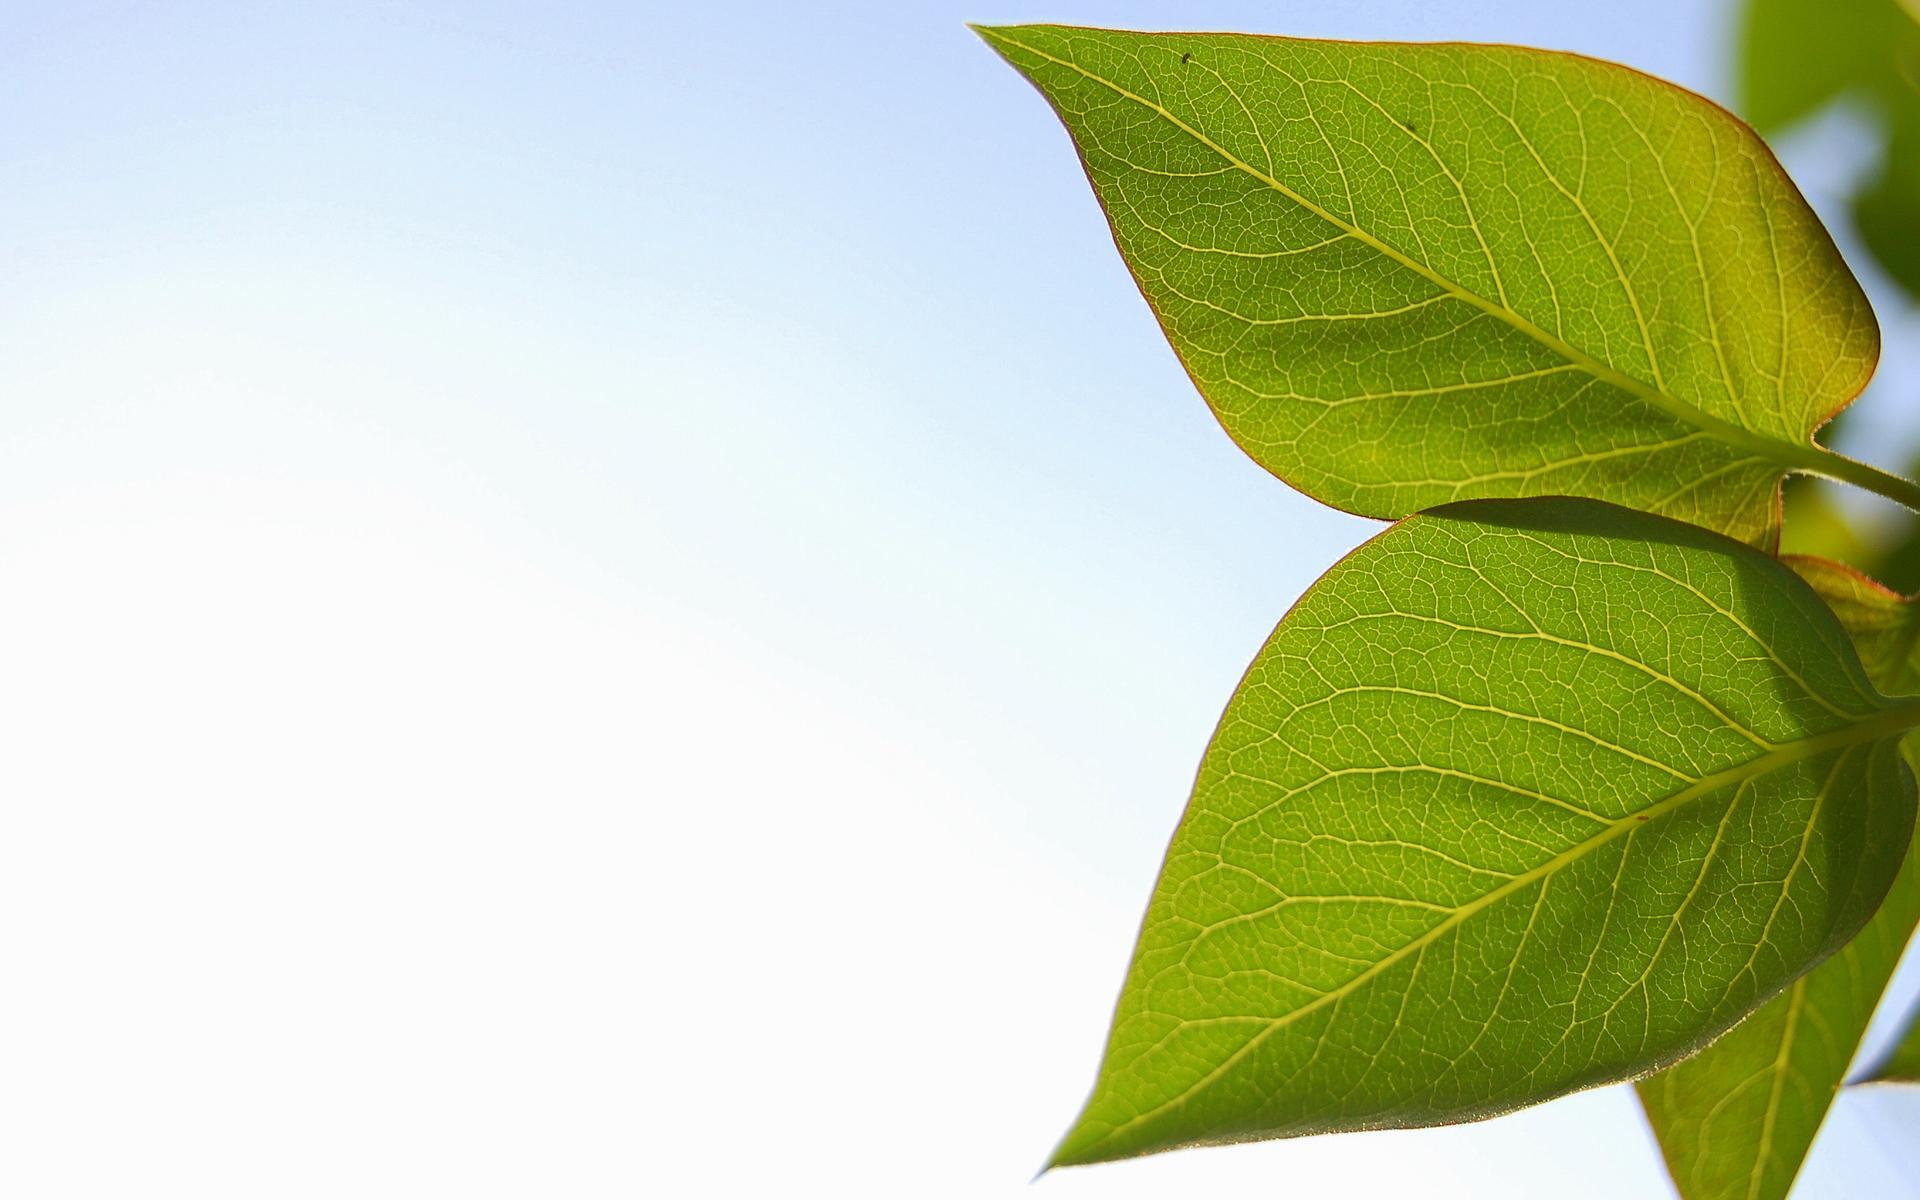 Leaves Wallpaper; Leaves Wallpaper; Leaves Wallpaper ...